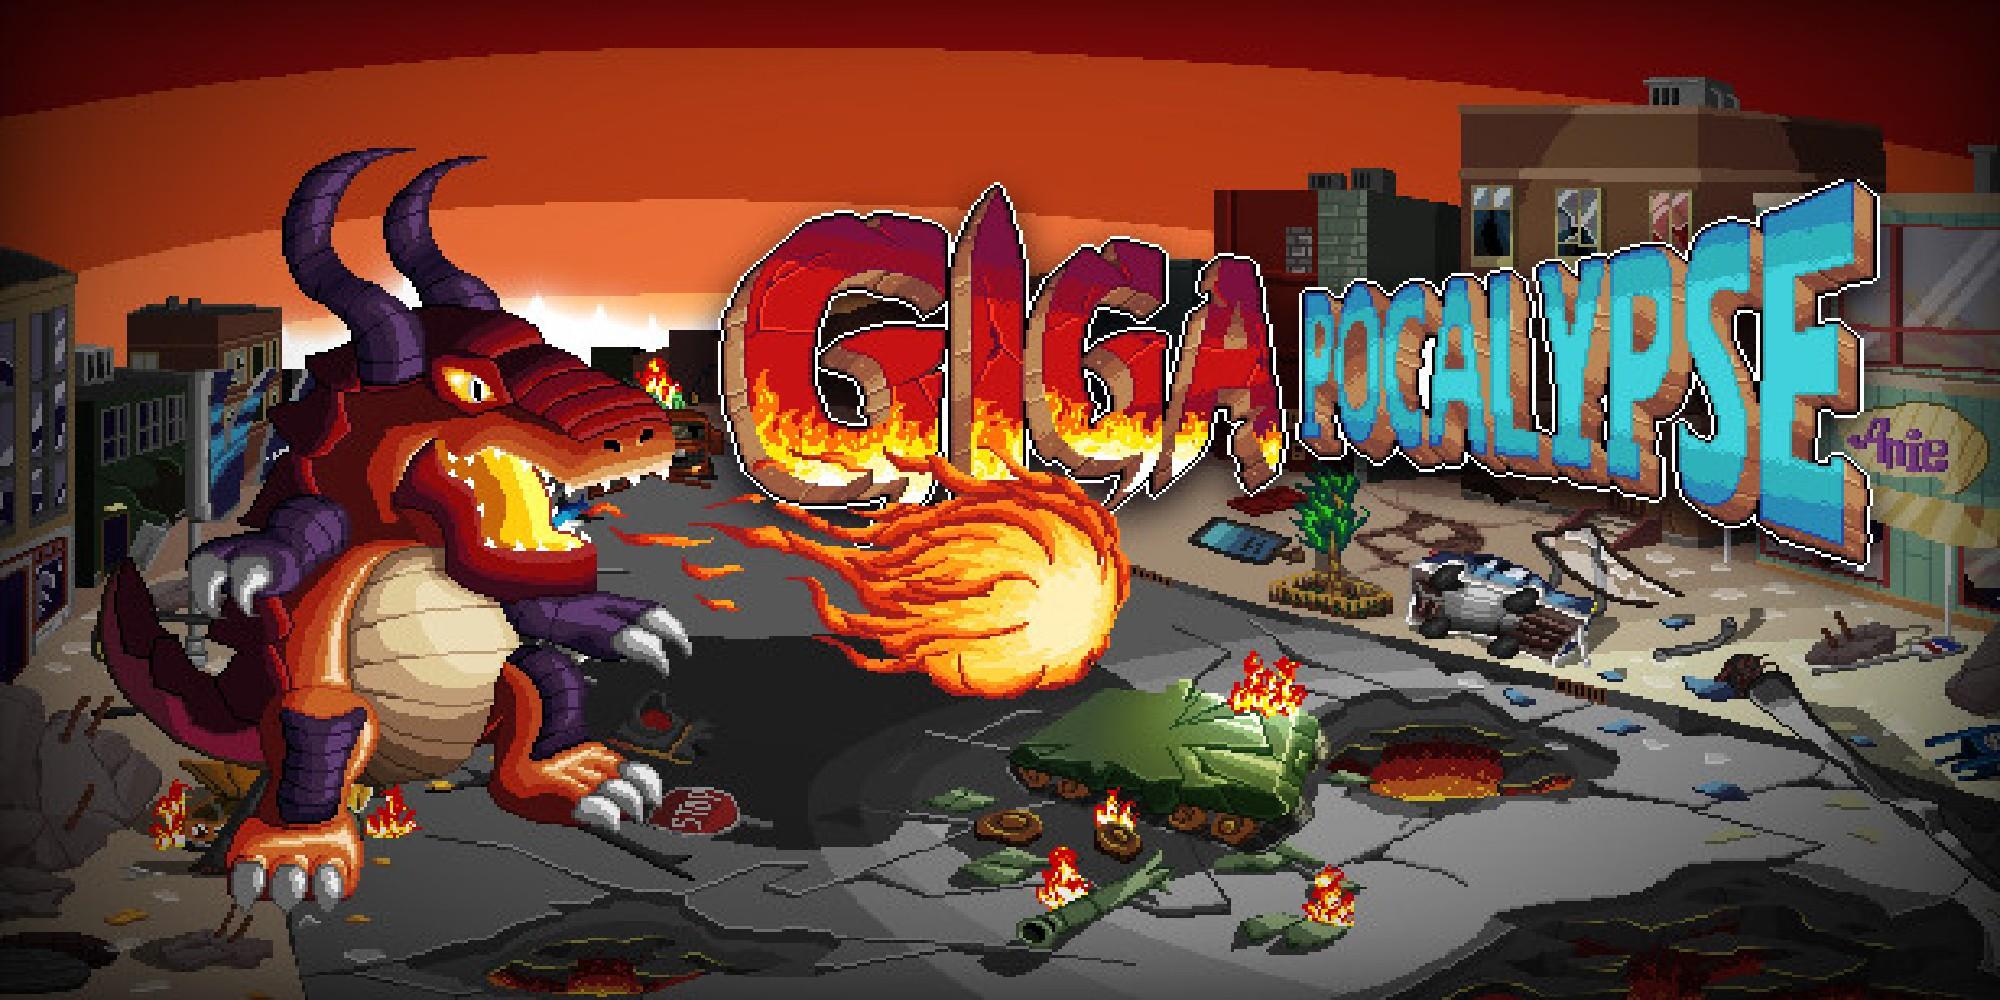 Gigapocalypse Review